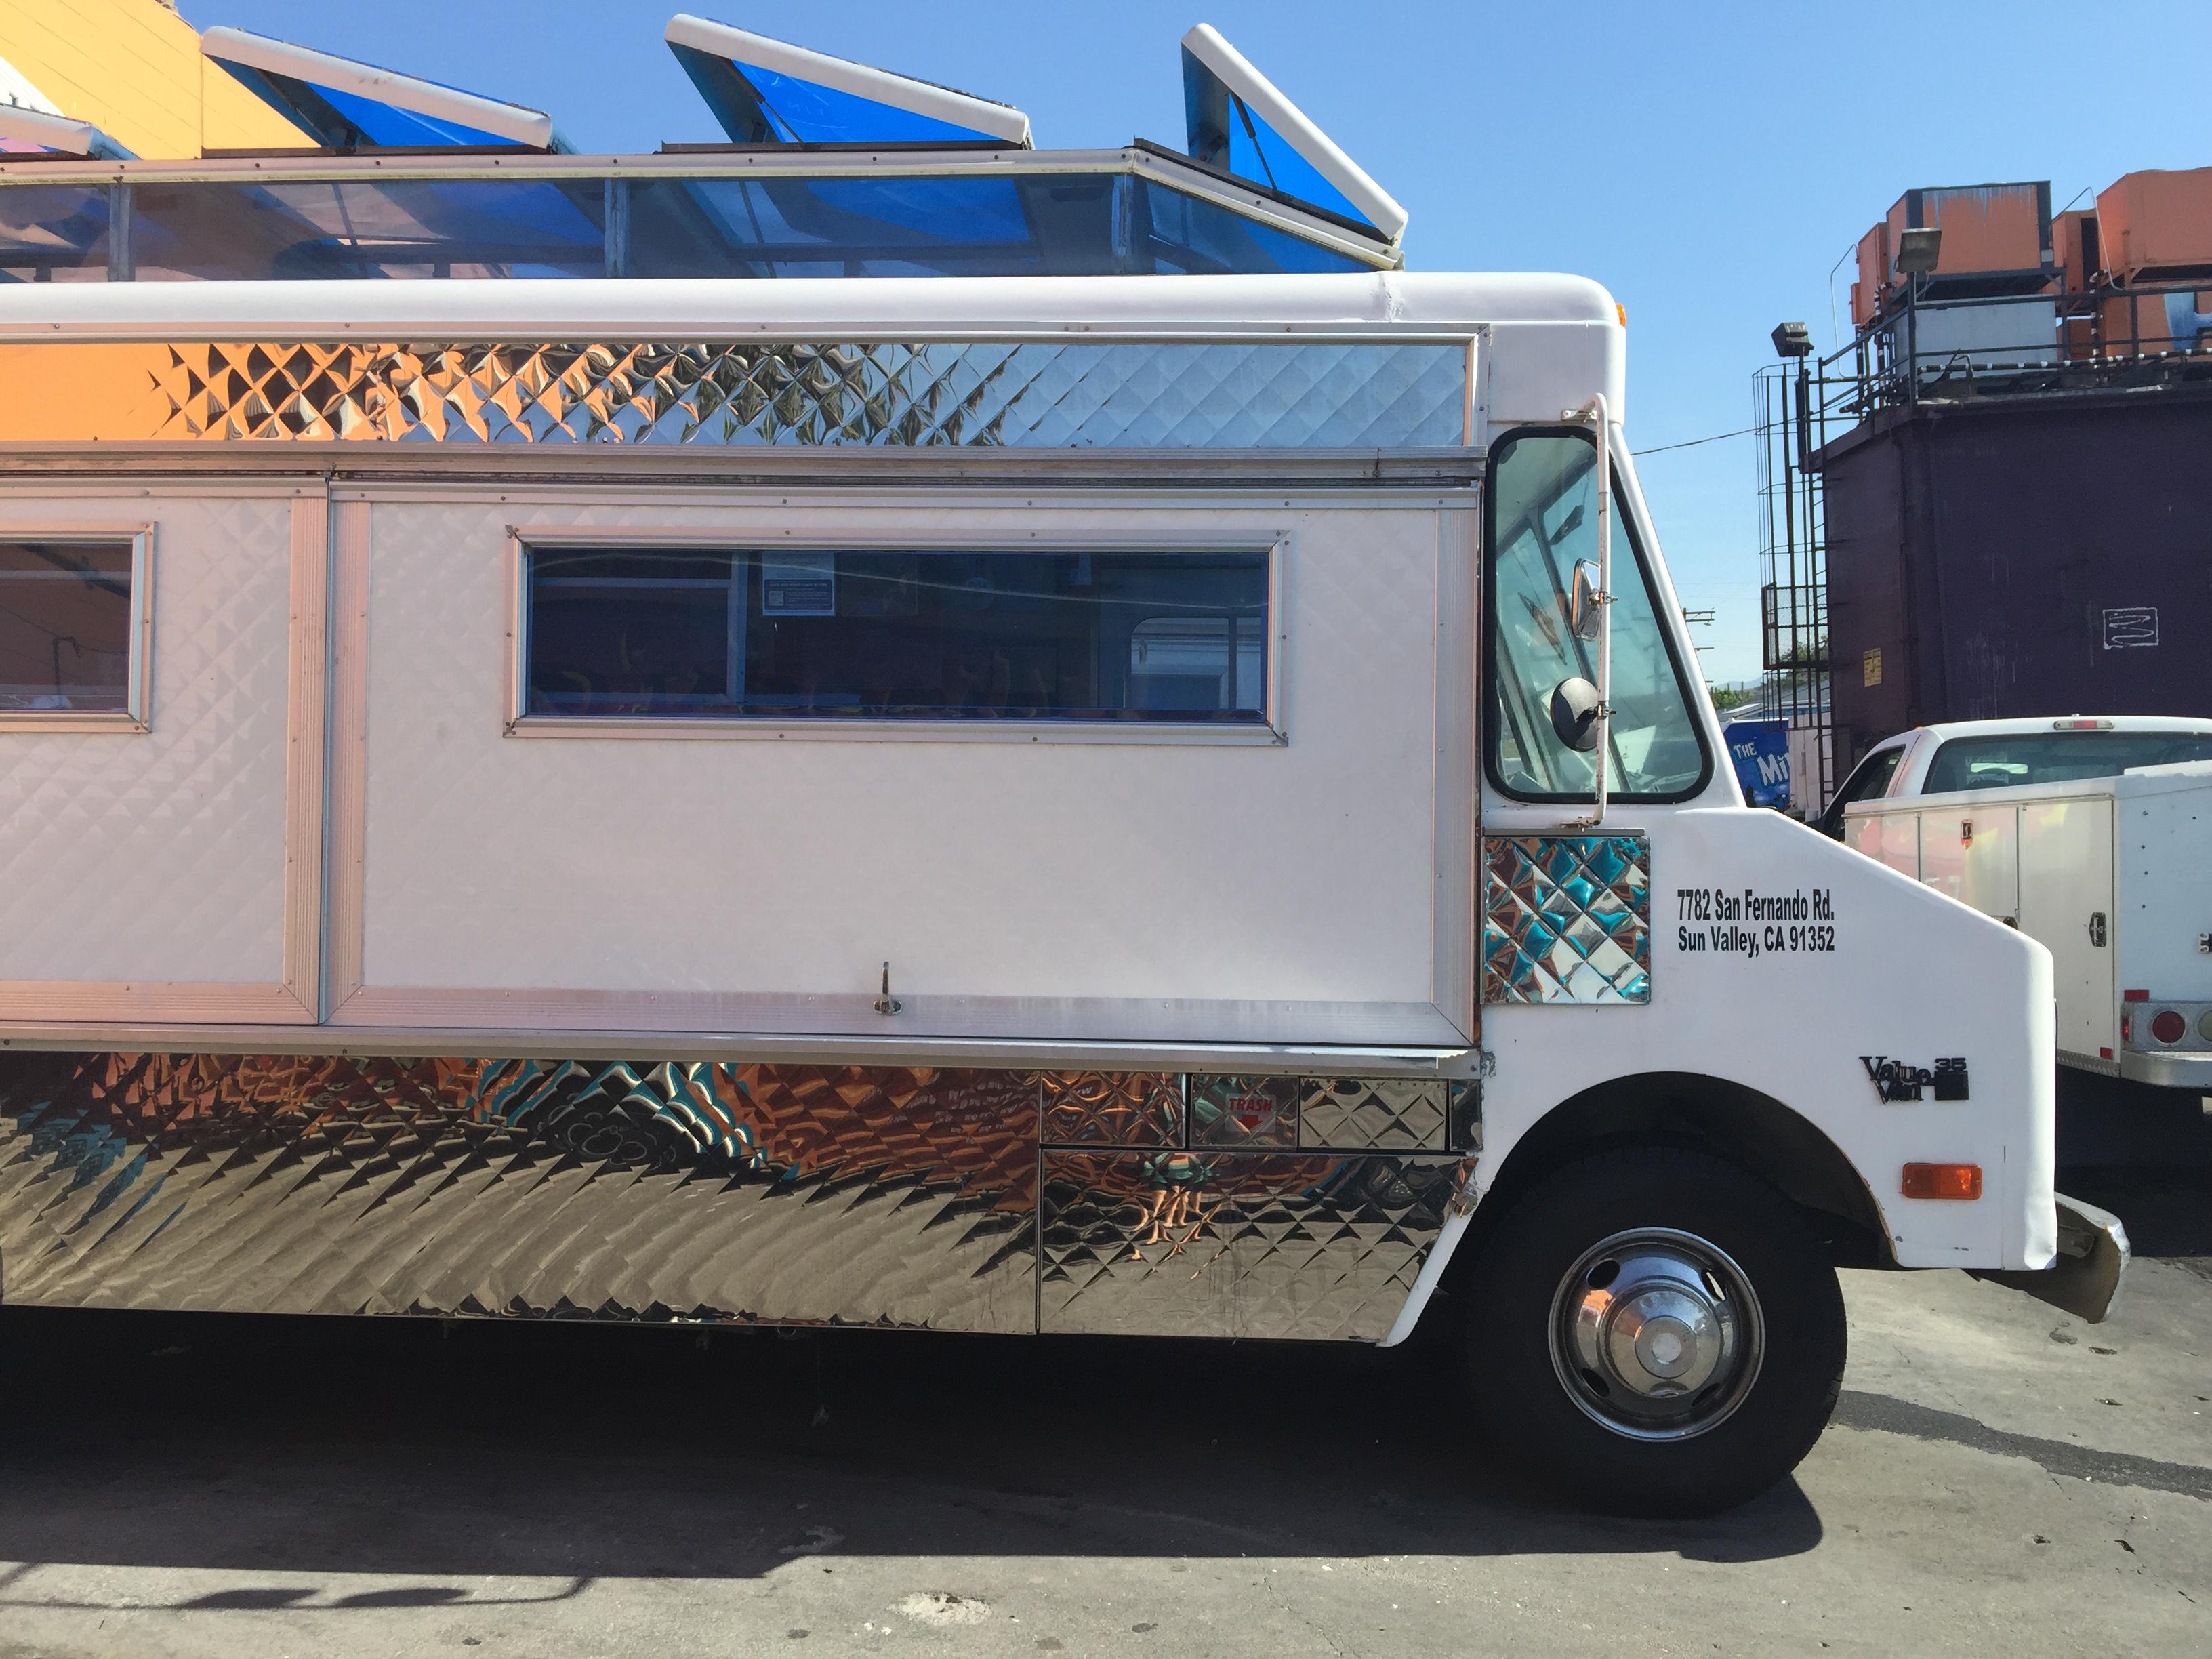 18ft remodeled food truck